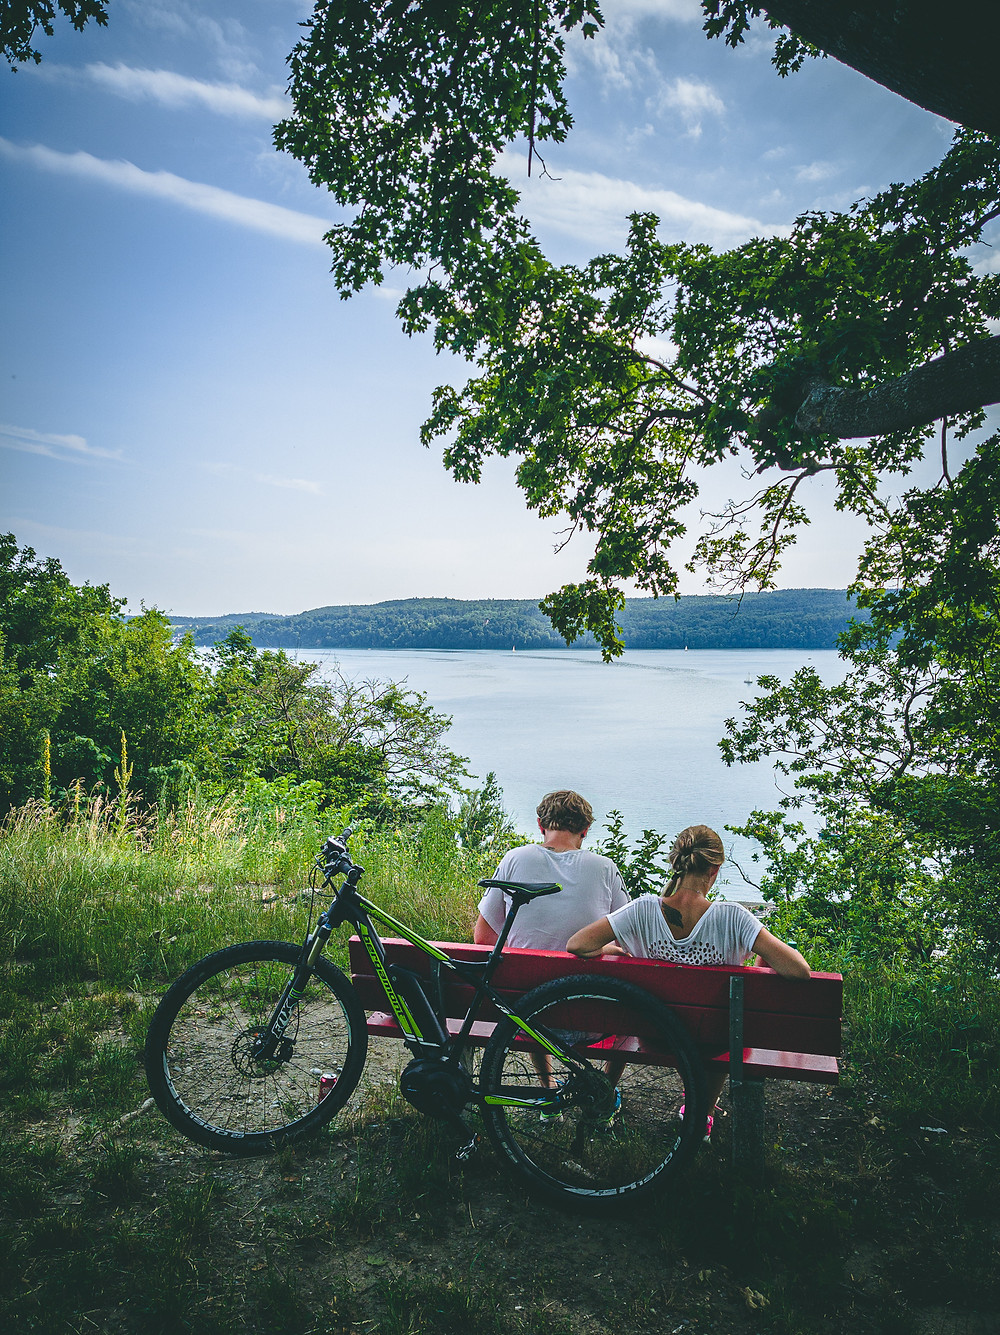 Mit dem E-Bike entspannt am Bodensee entlang